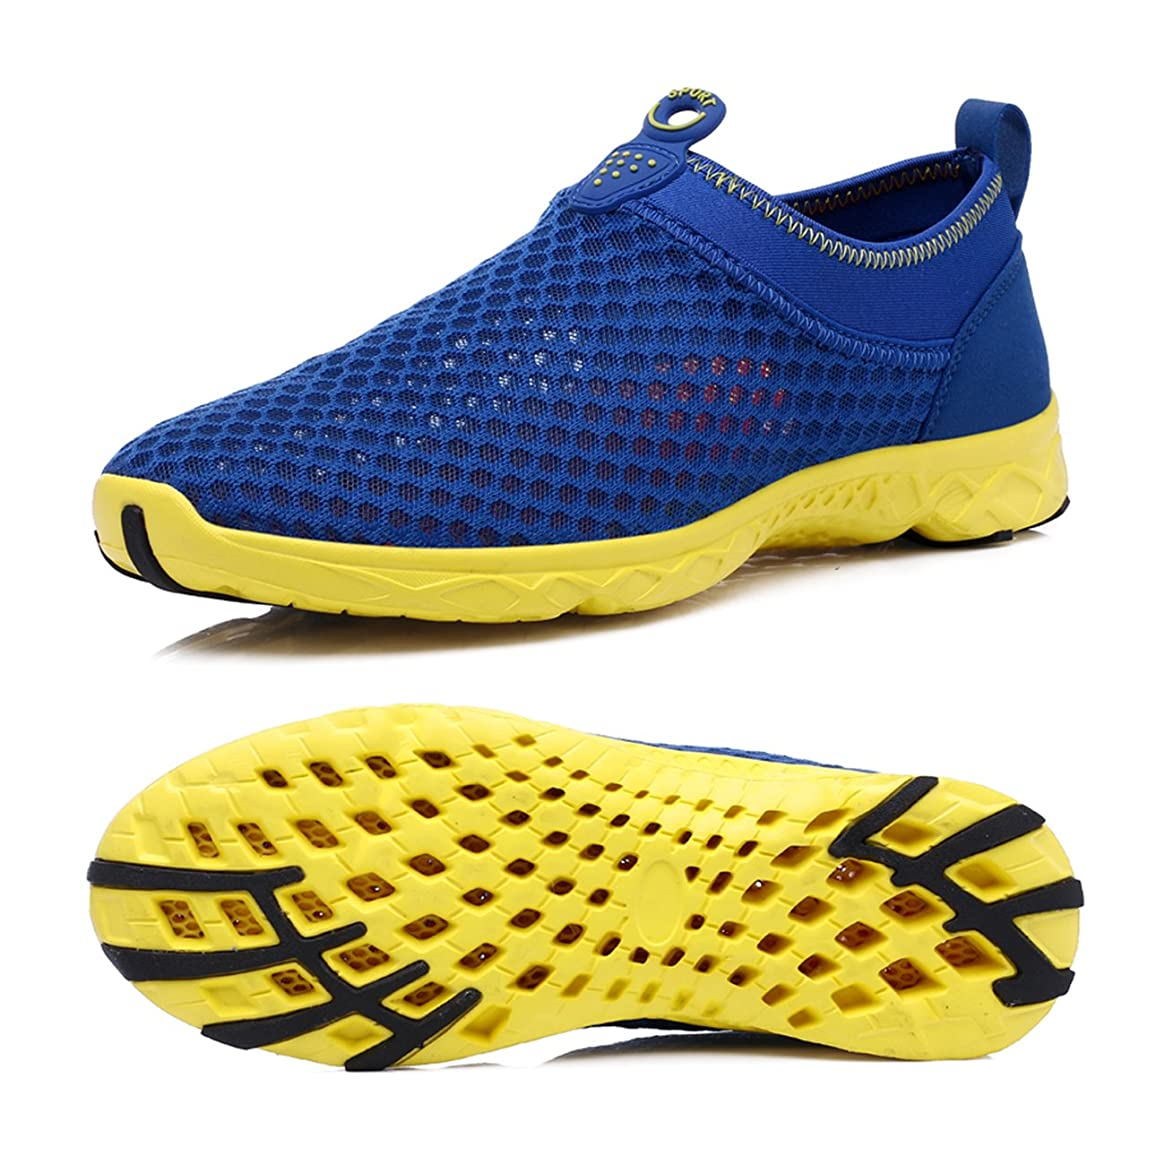 Wonder Pretty Walking Shoes Air Mesh Lightweight Running Gear Quick Dry Aqua Slip on Water Shoes for Women Men